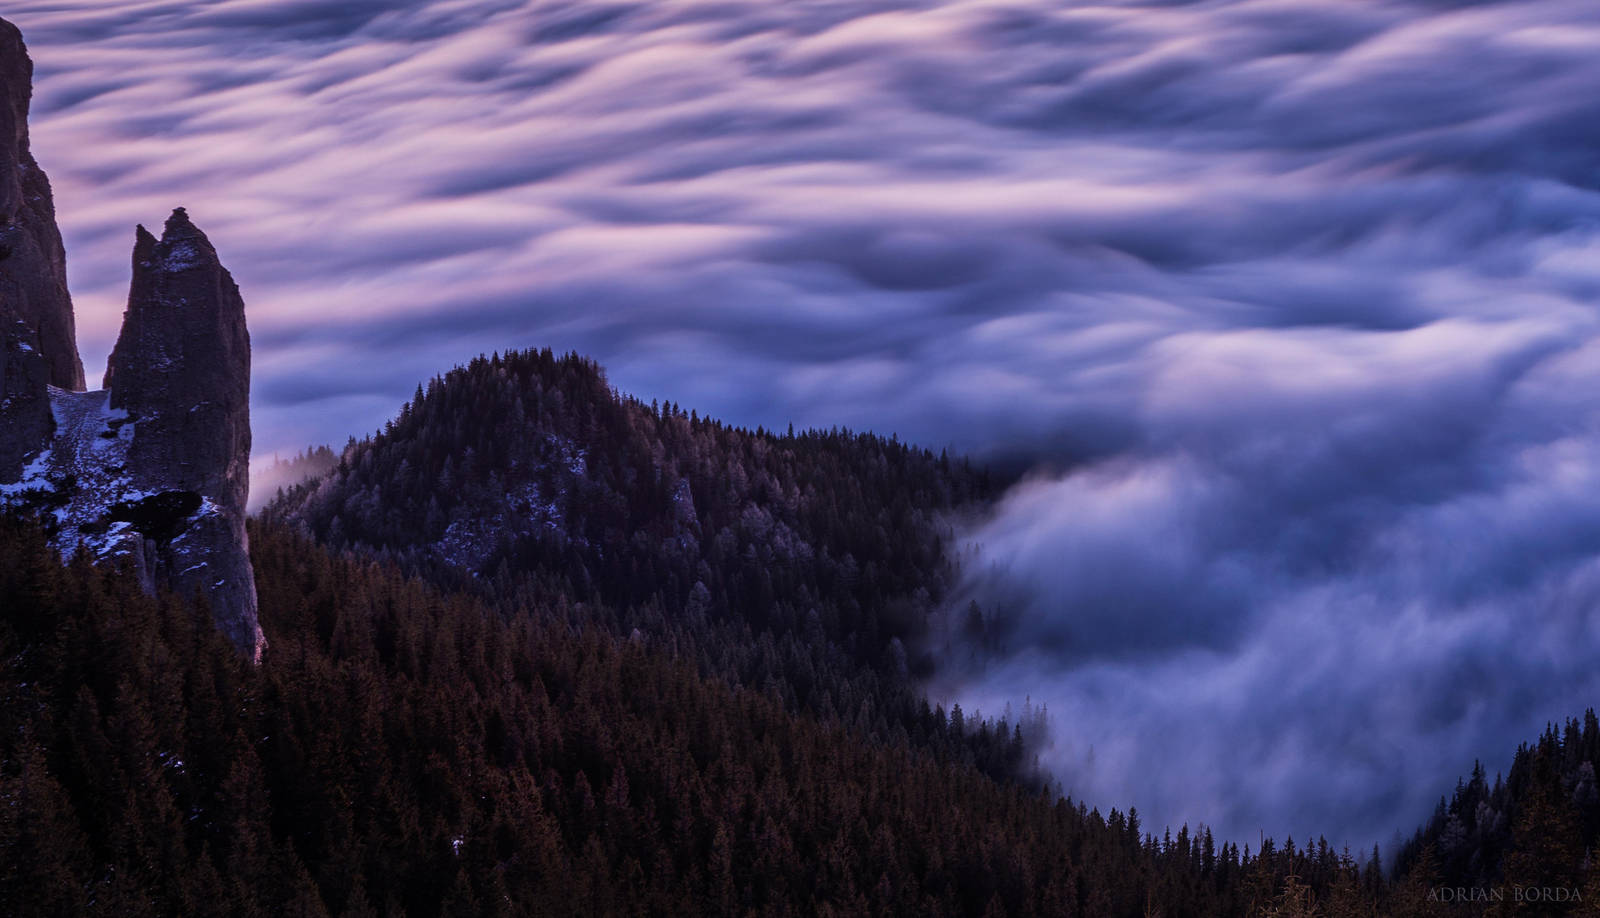 Cloud Ocean by borda